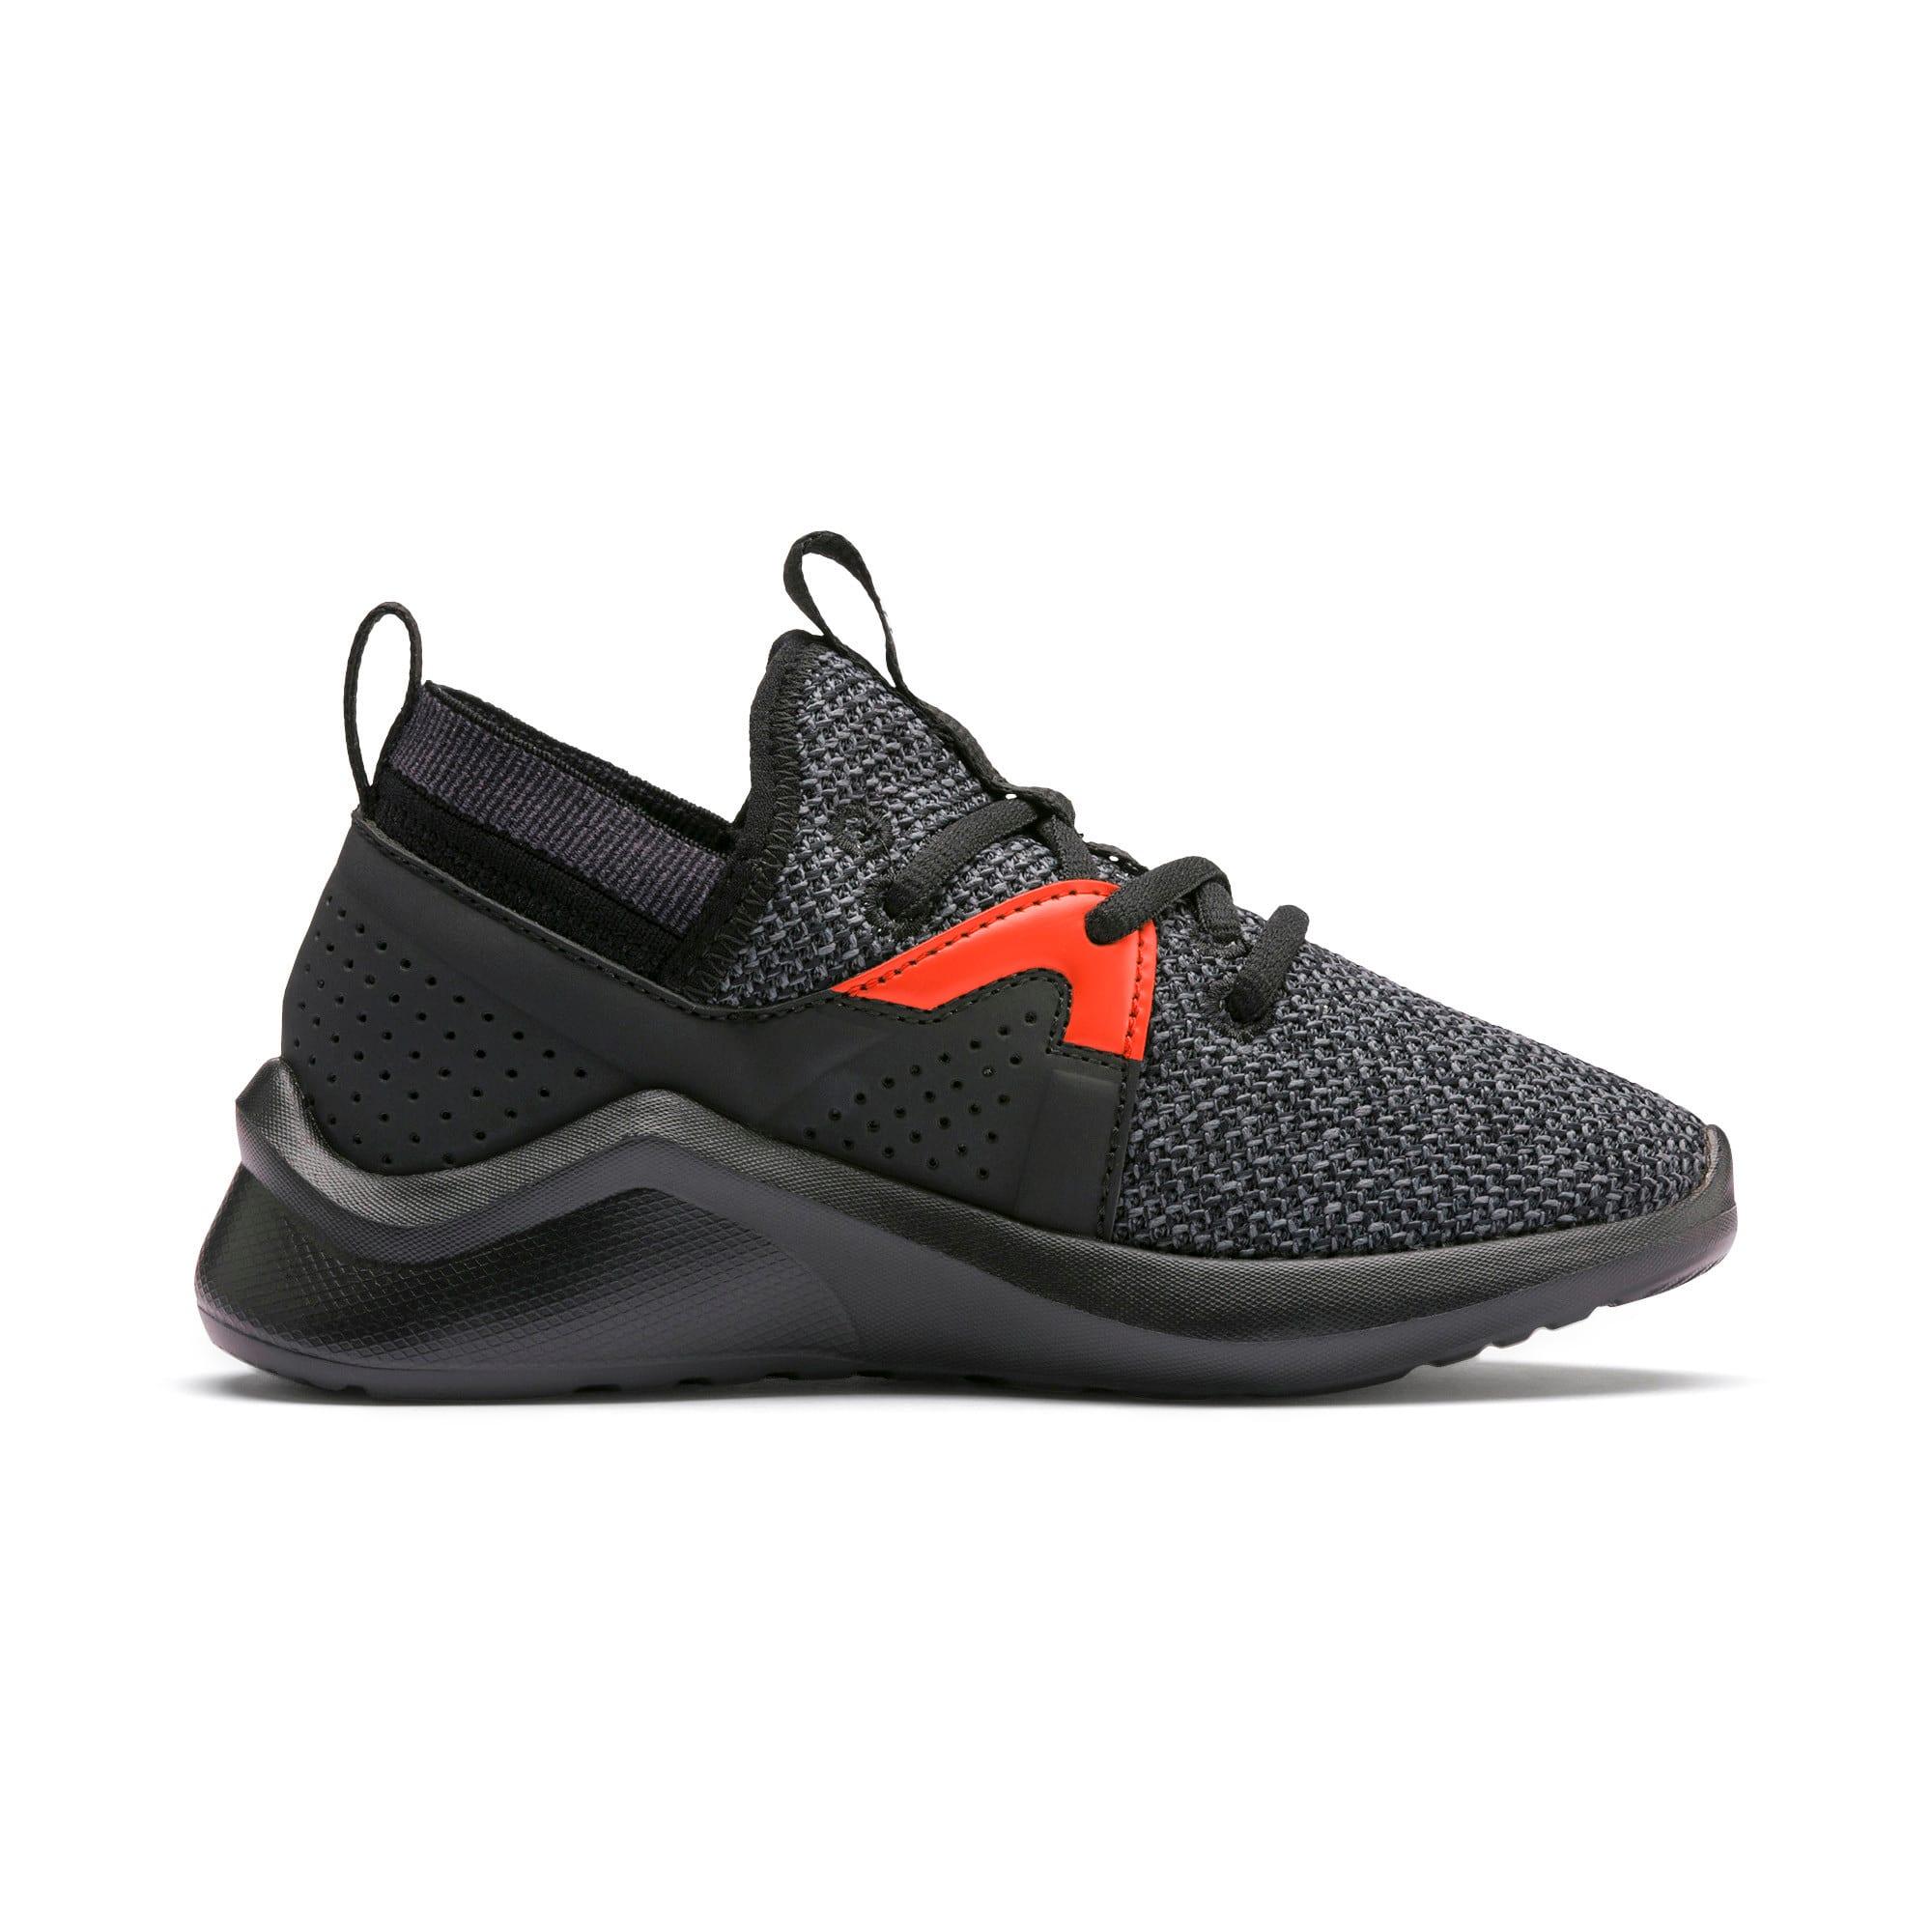 Thumbnail 5 of Emergence Little Kids' Shoes, Puma Black-Cherry Tomato, medium